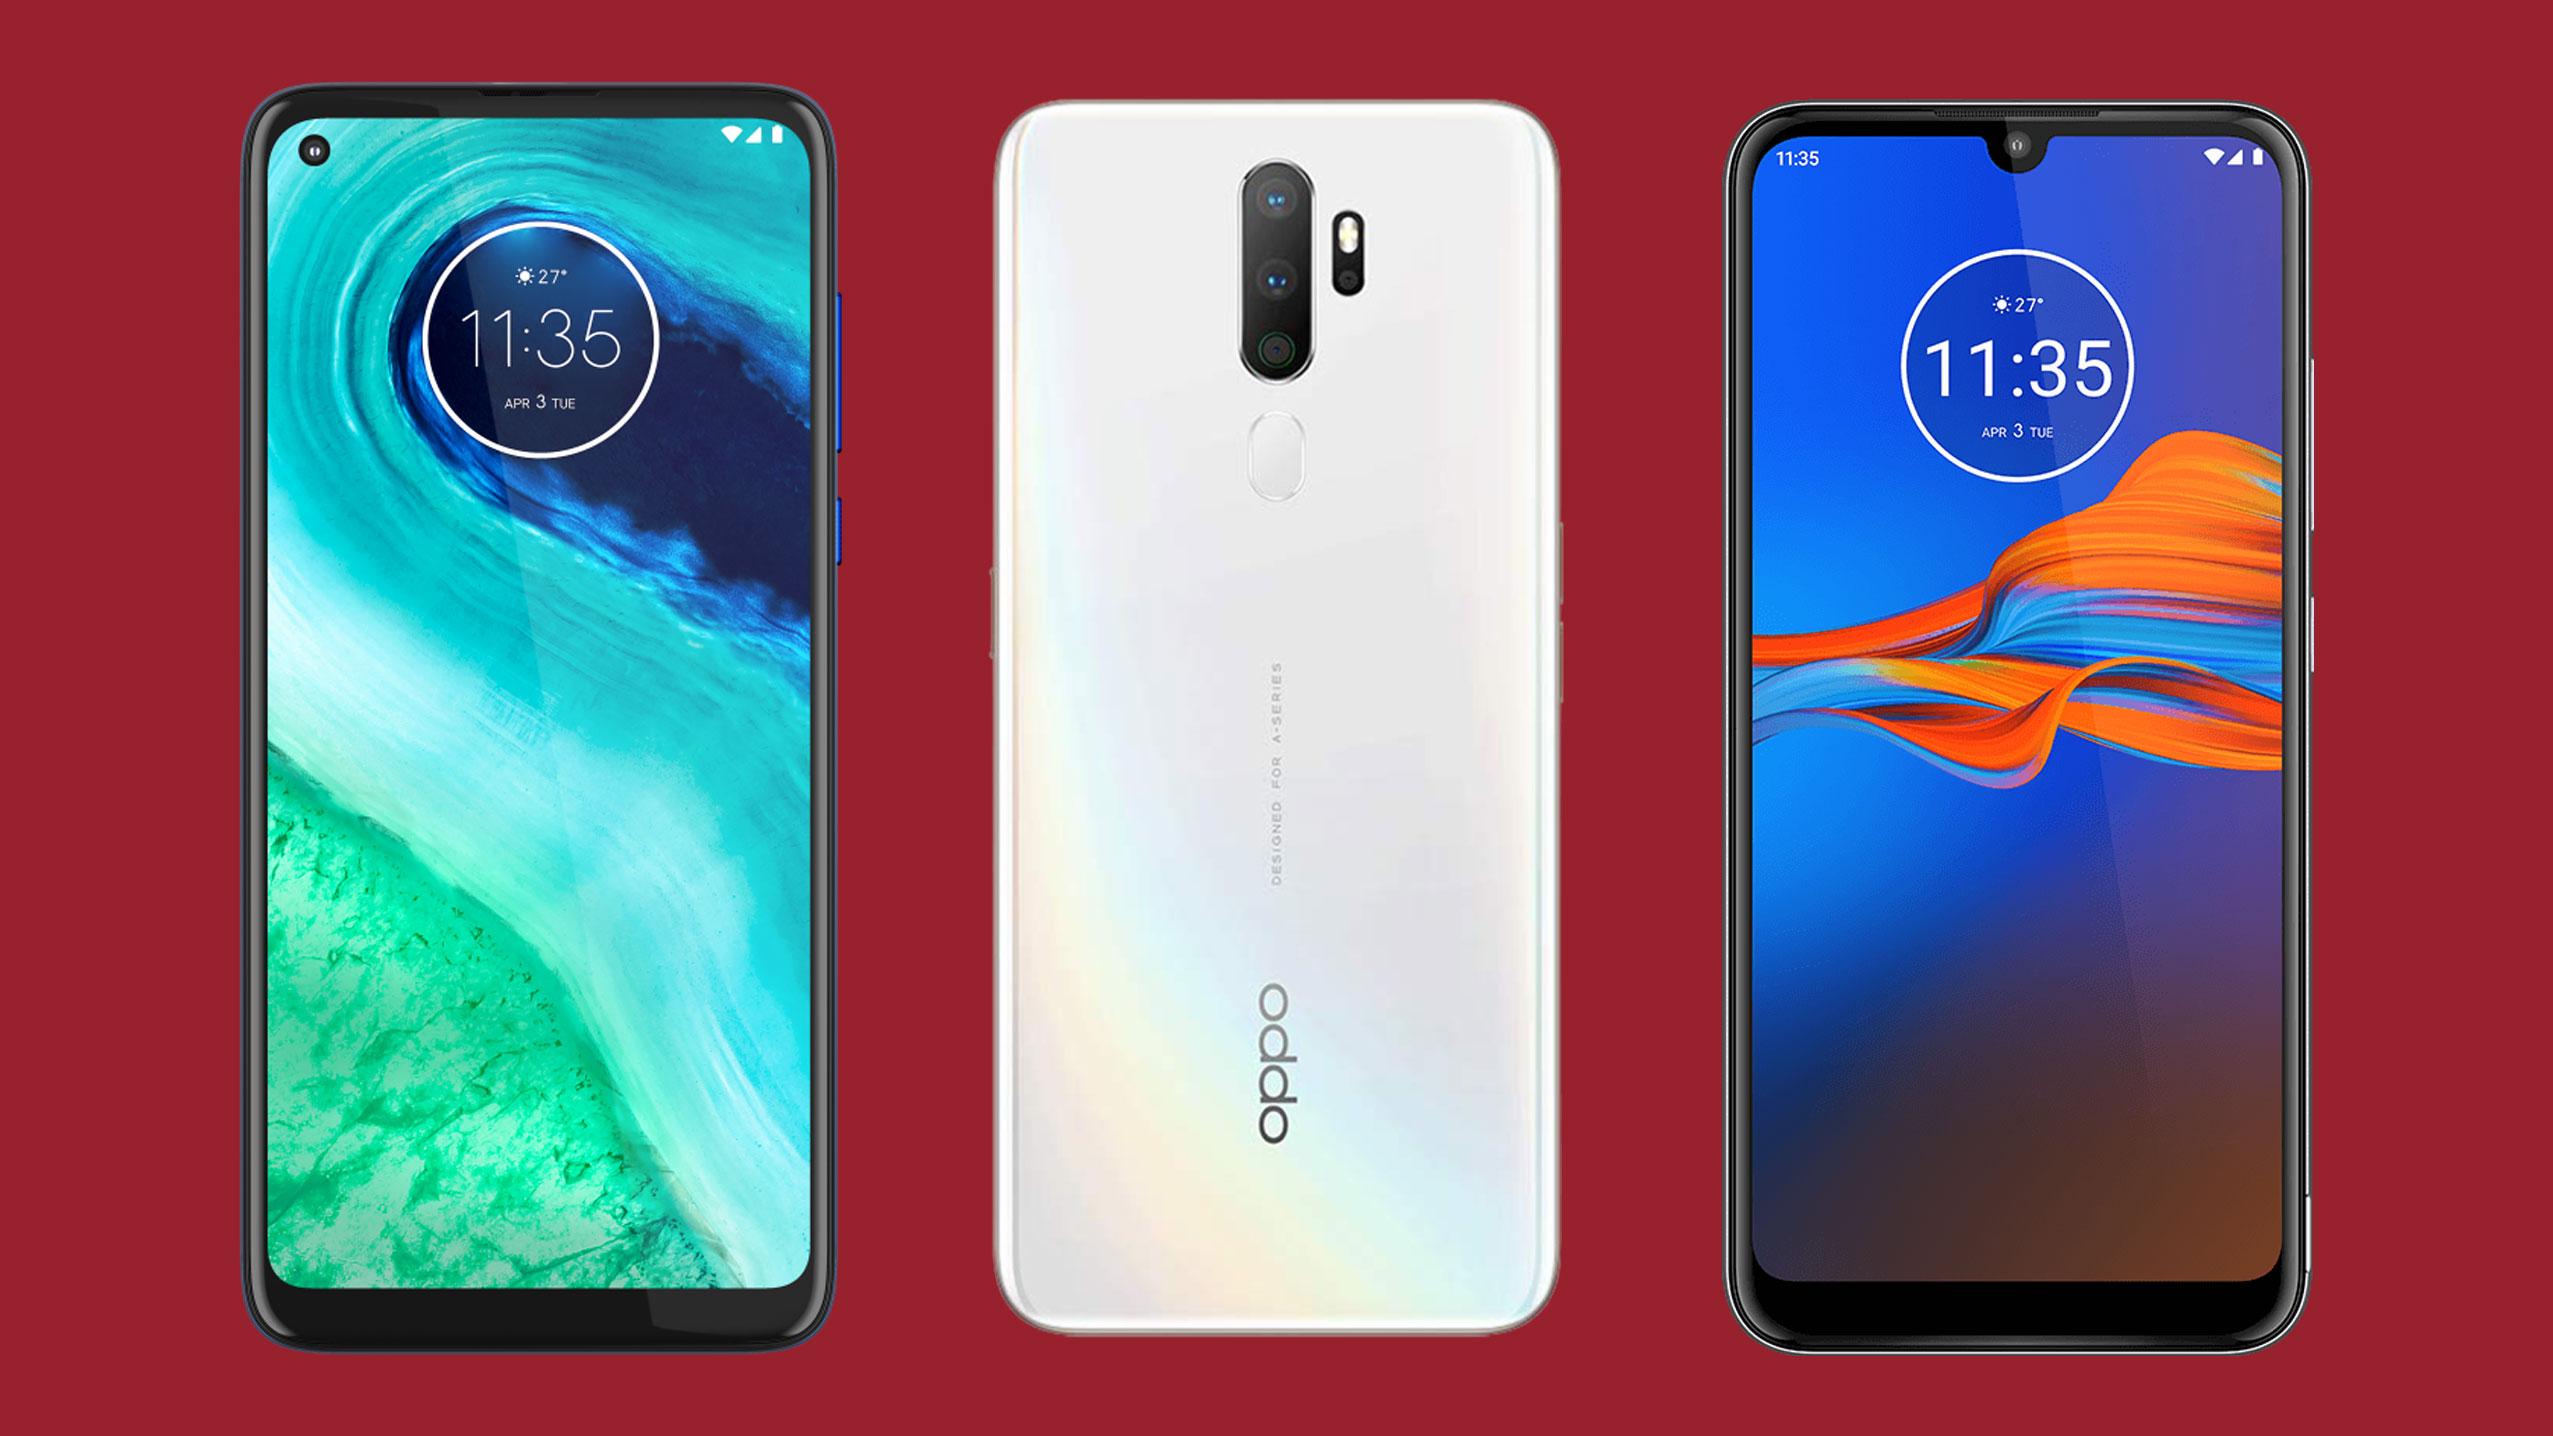 Cheap Phones 2021 The Best Budget Smartphones Ranked Techradar